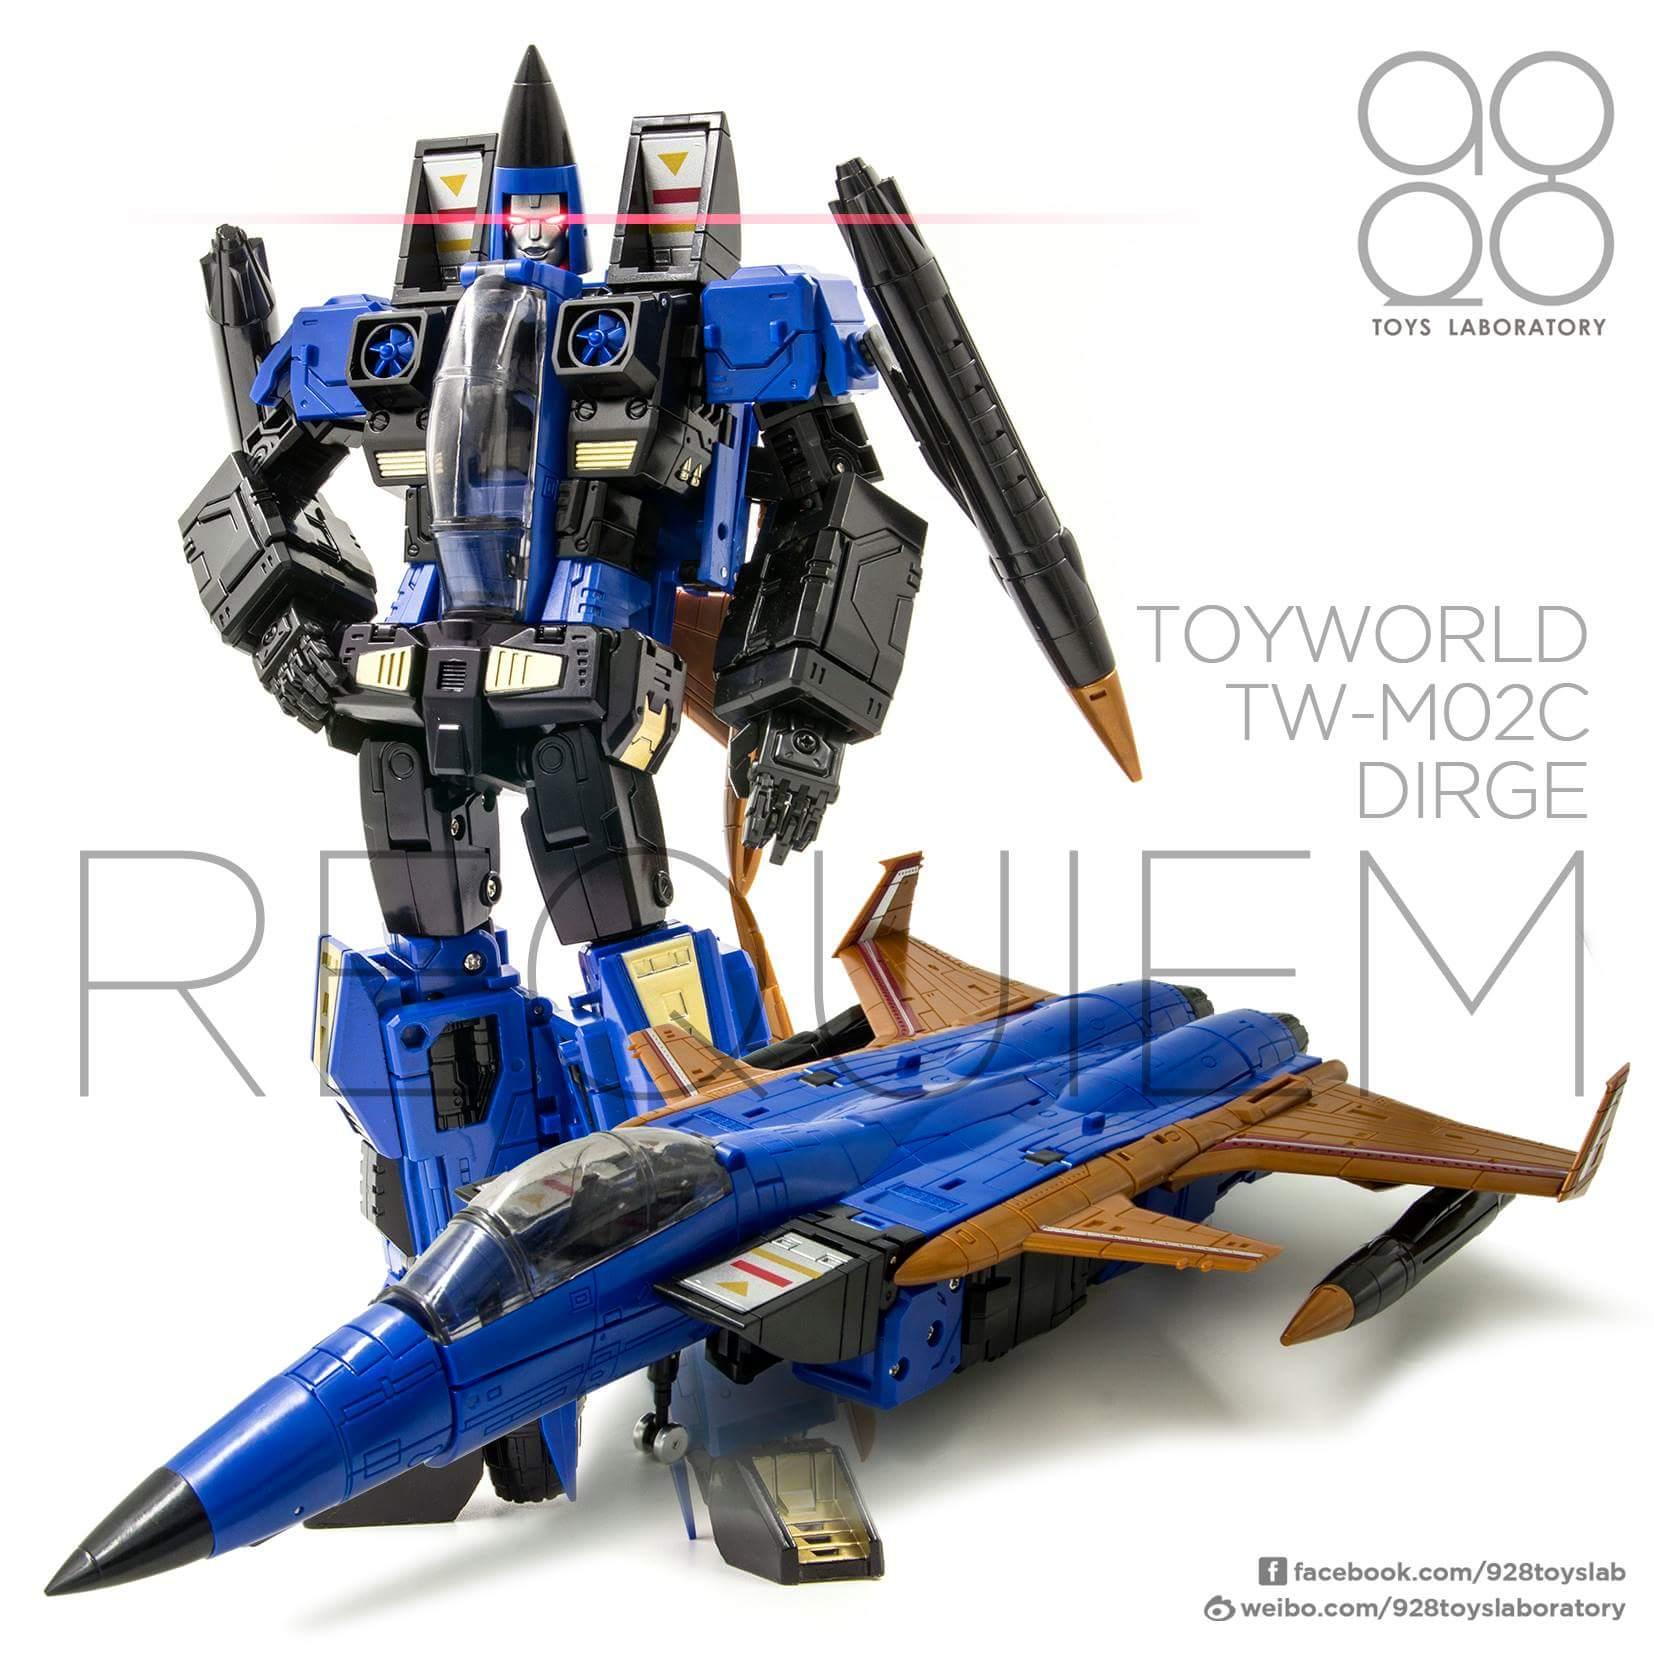 [ToyWorld] Produit Tiers - TW-M02A Combustor (Ramjet/Statoréacto), TW-M02B Assault (Thrust/Fatalo), TW-M02C Requiem (Dirge/Funébro) - Page 2 F89Dbou4